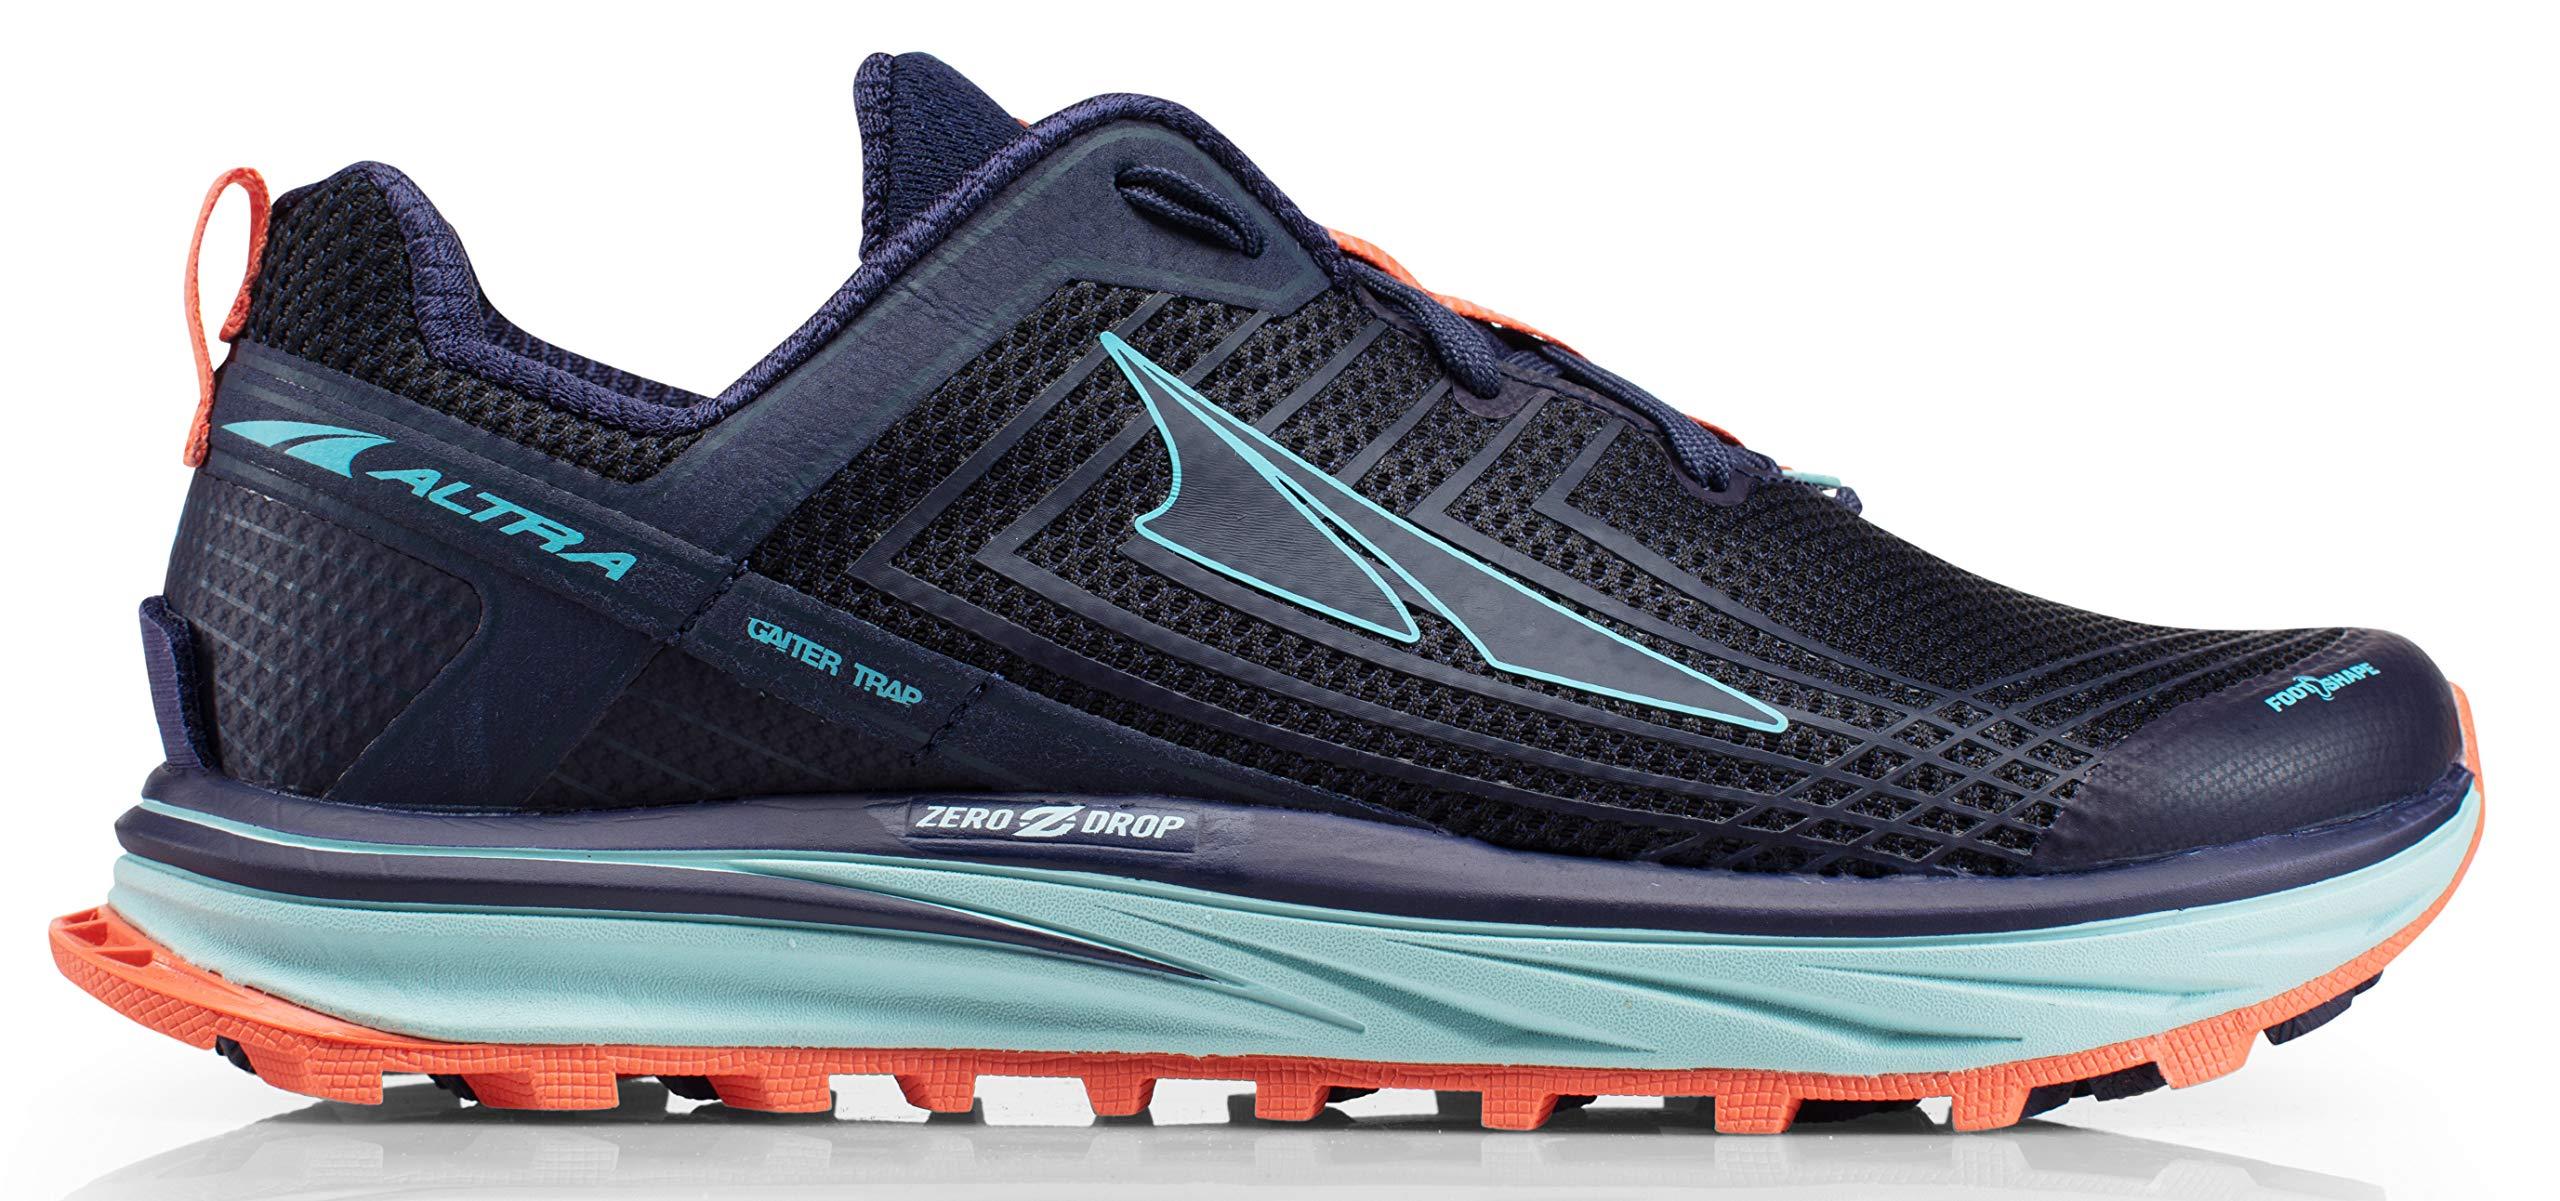 Altra AFW1957F Women's TIMP 1.5 Trail Running Shoe, Dark Blue - 6 B(M) US